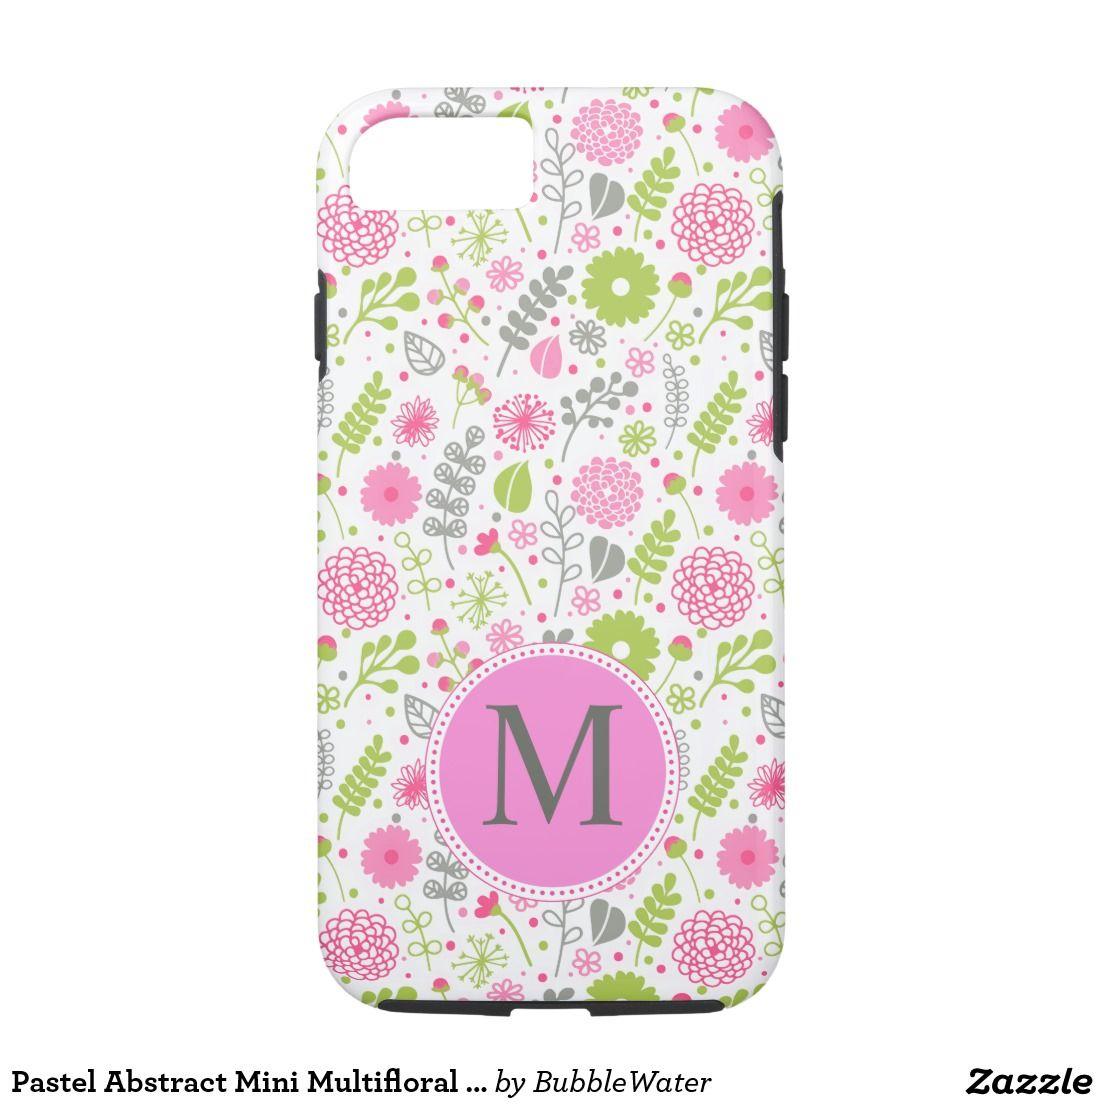 Pastel abstract mini multifloral monogram iphone 7 case